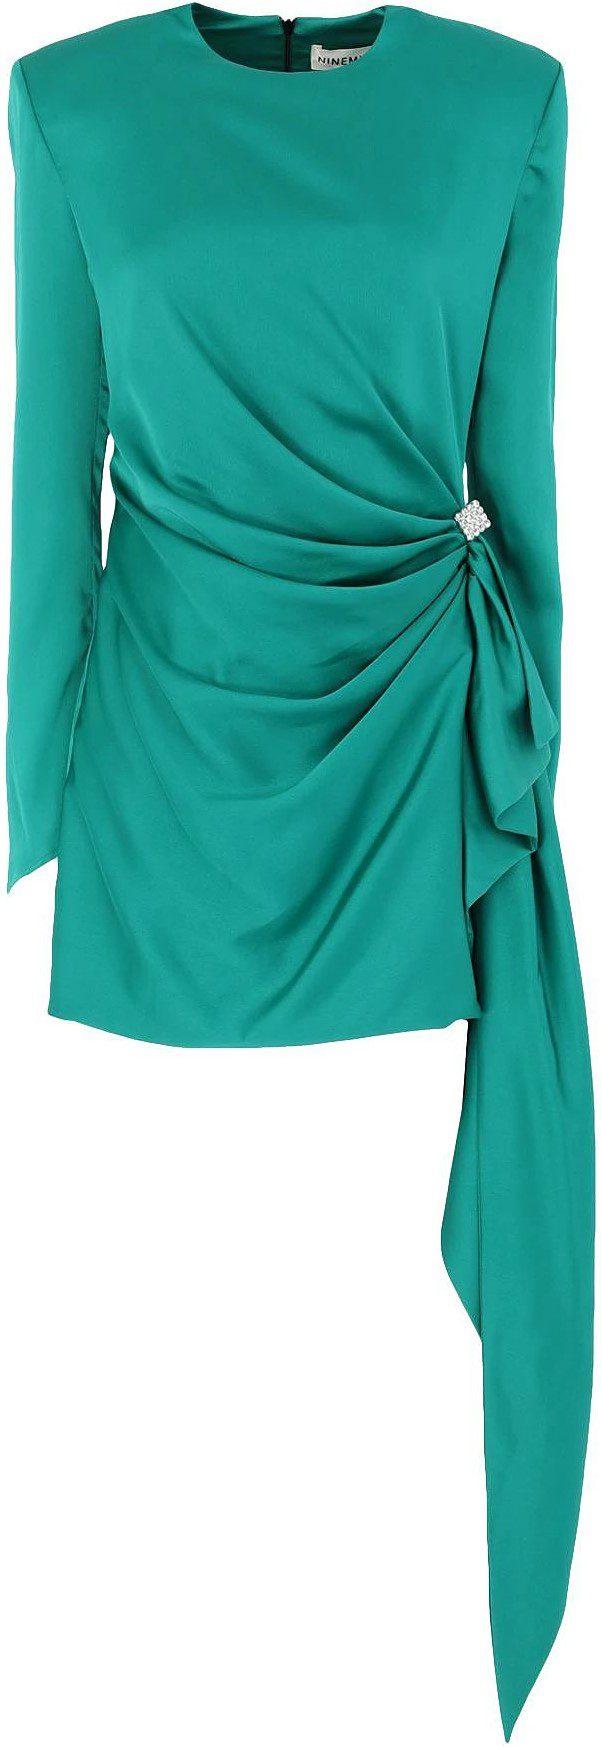 Green Short Dress-NINEMINUTES